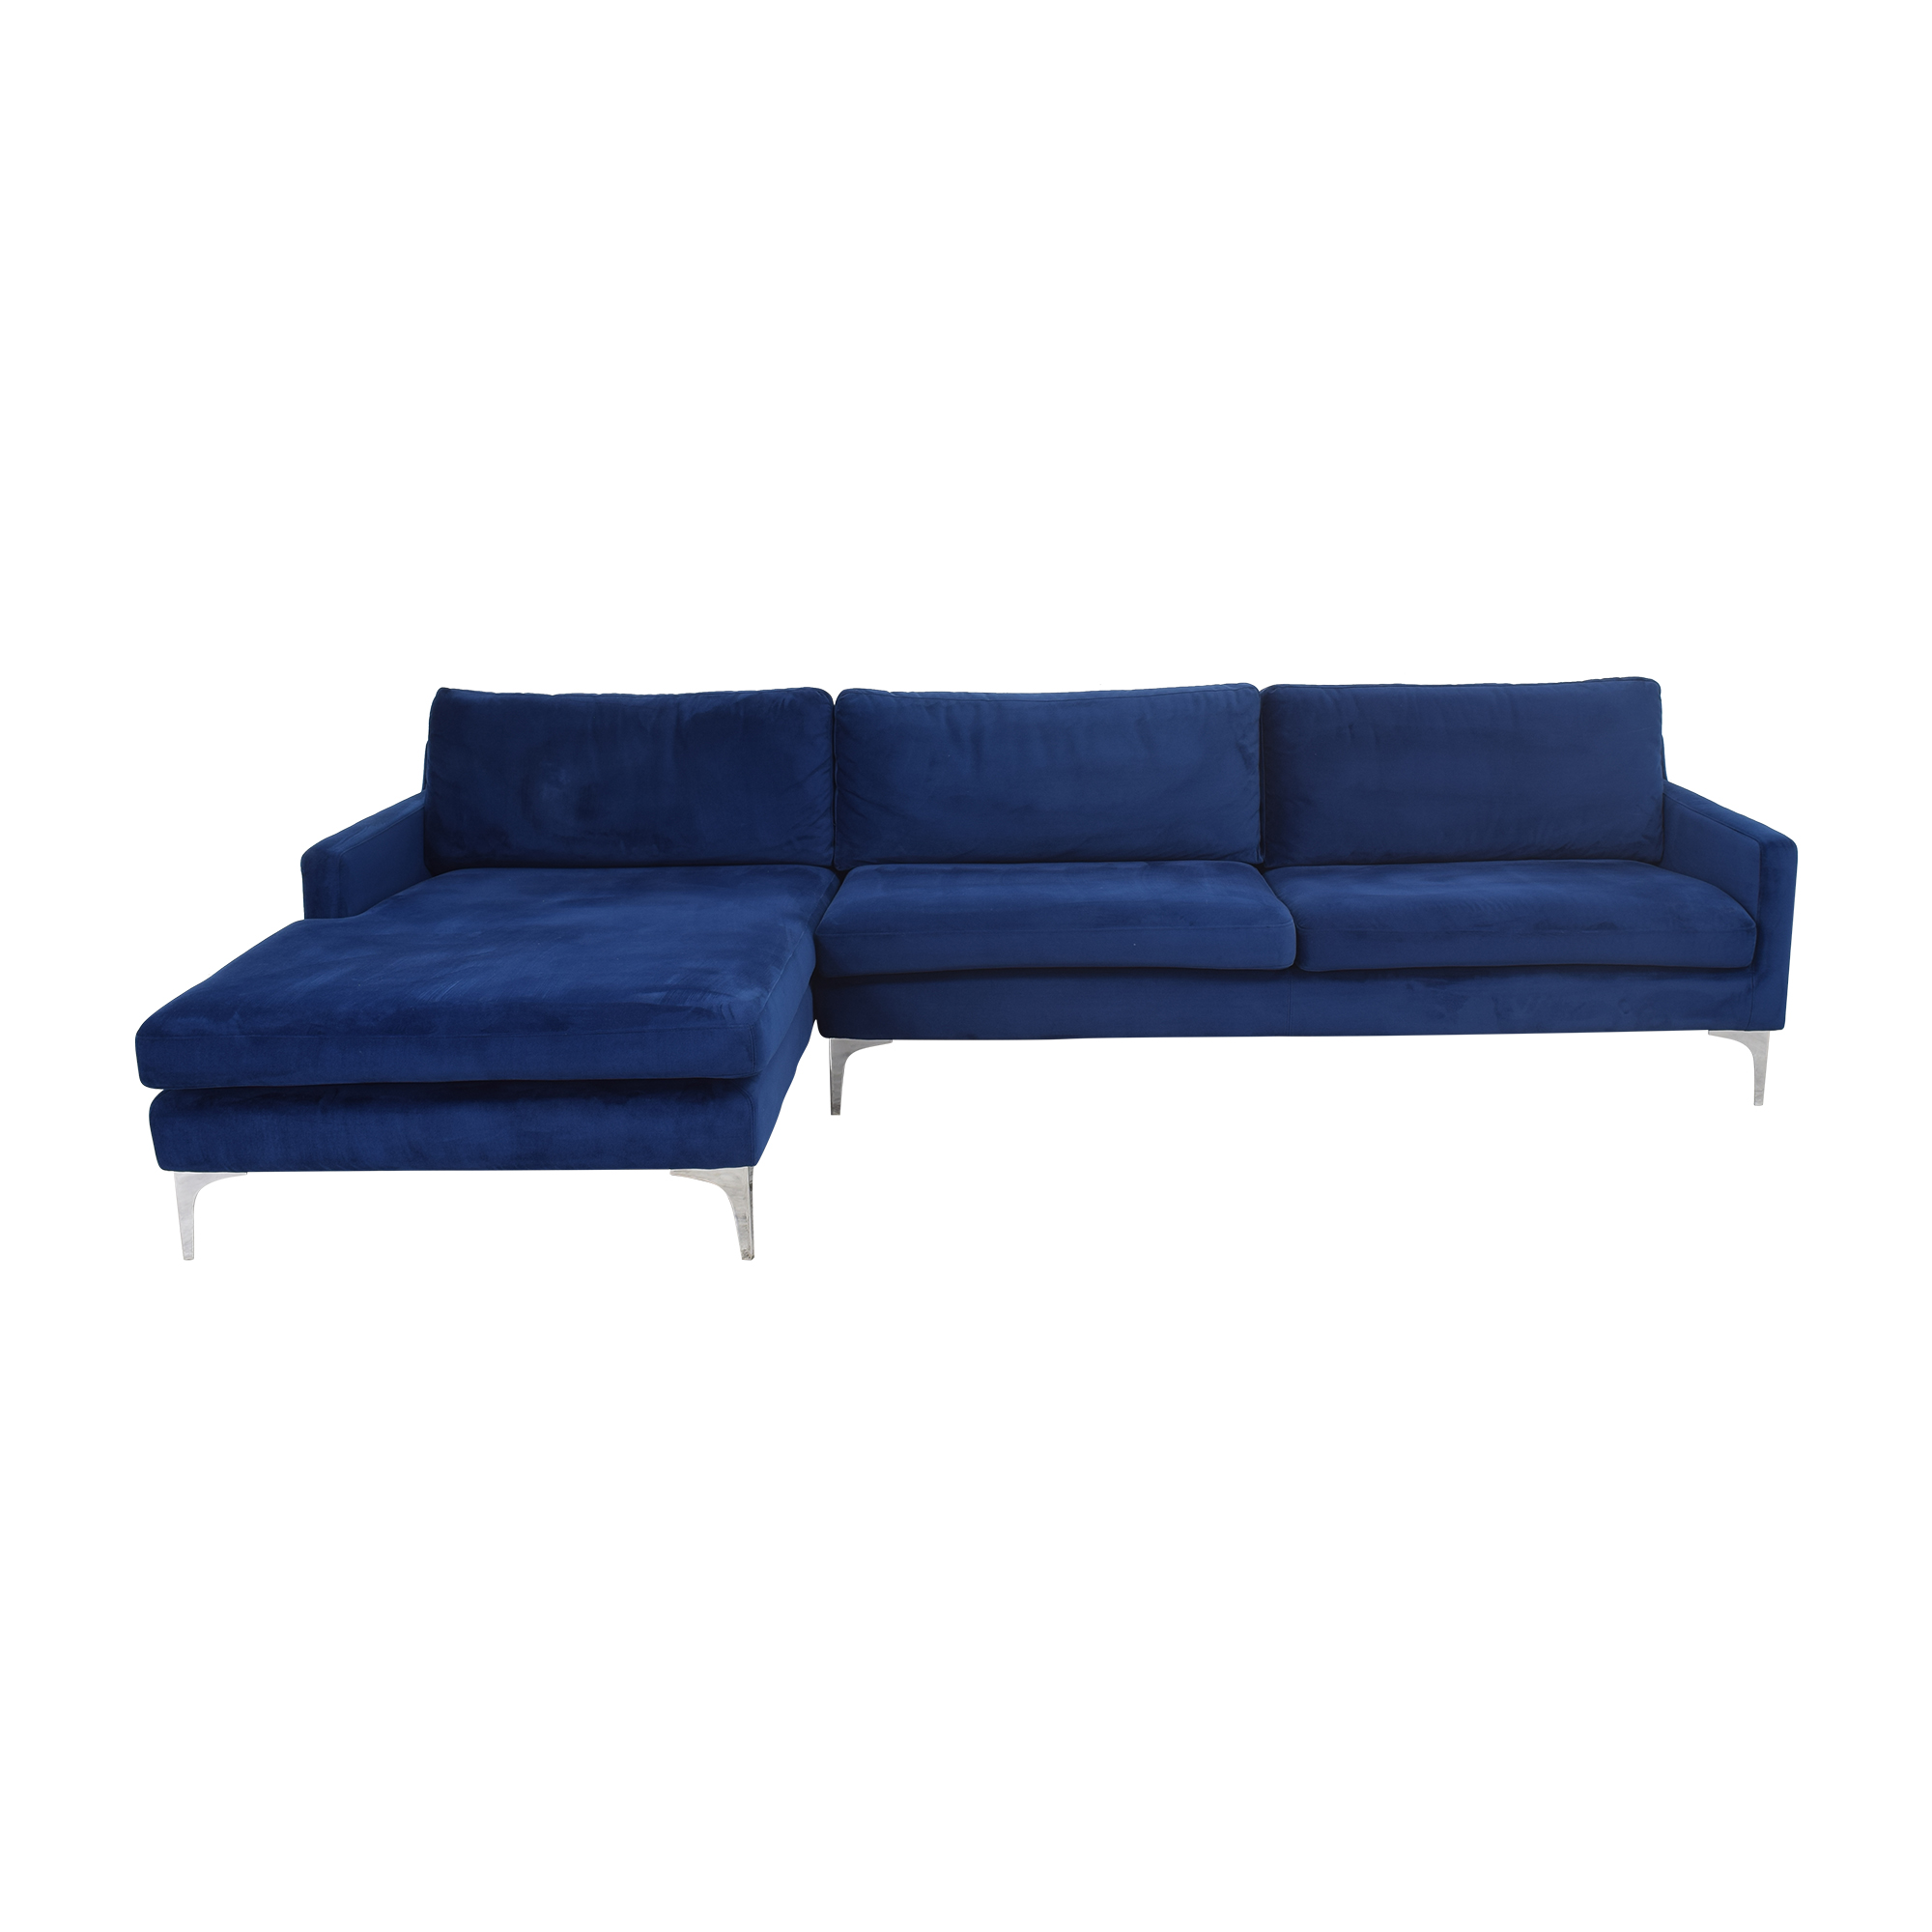 AllModern AllModern Bridgeton Sectional Sofa price